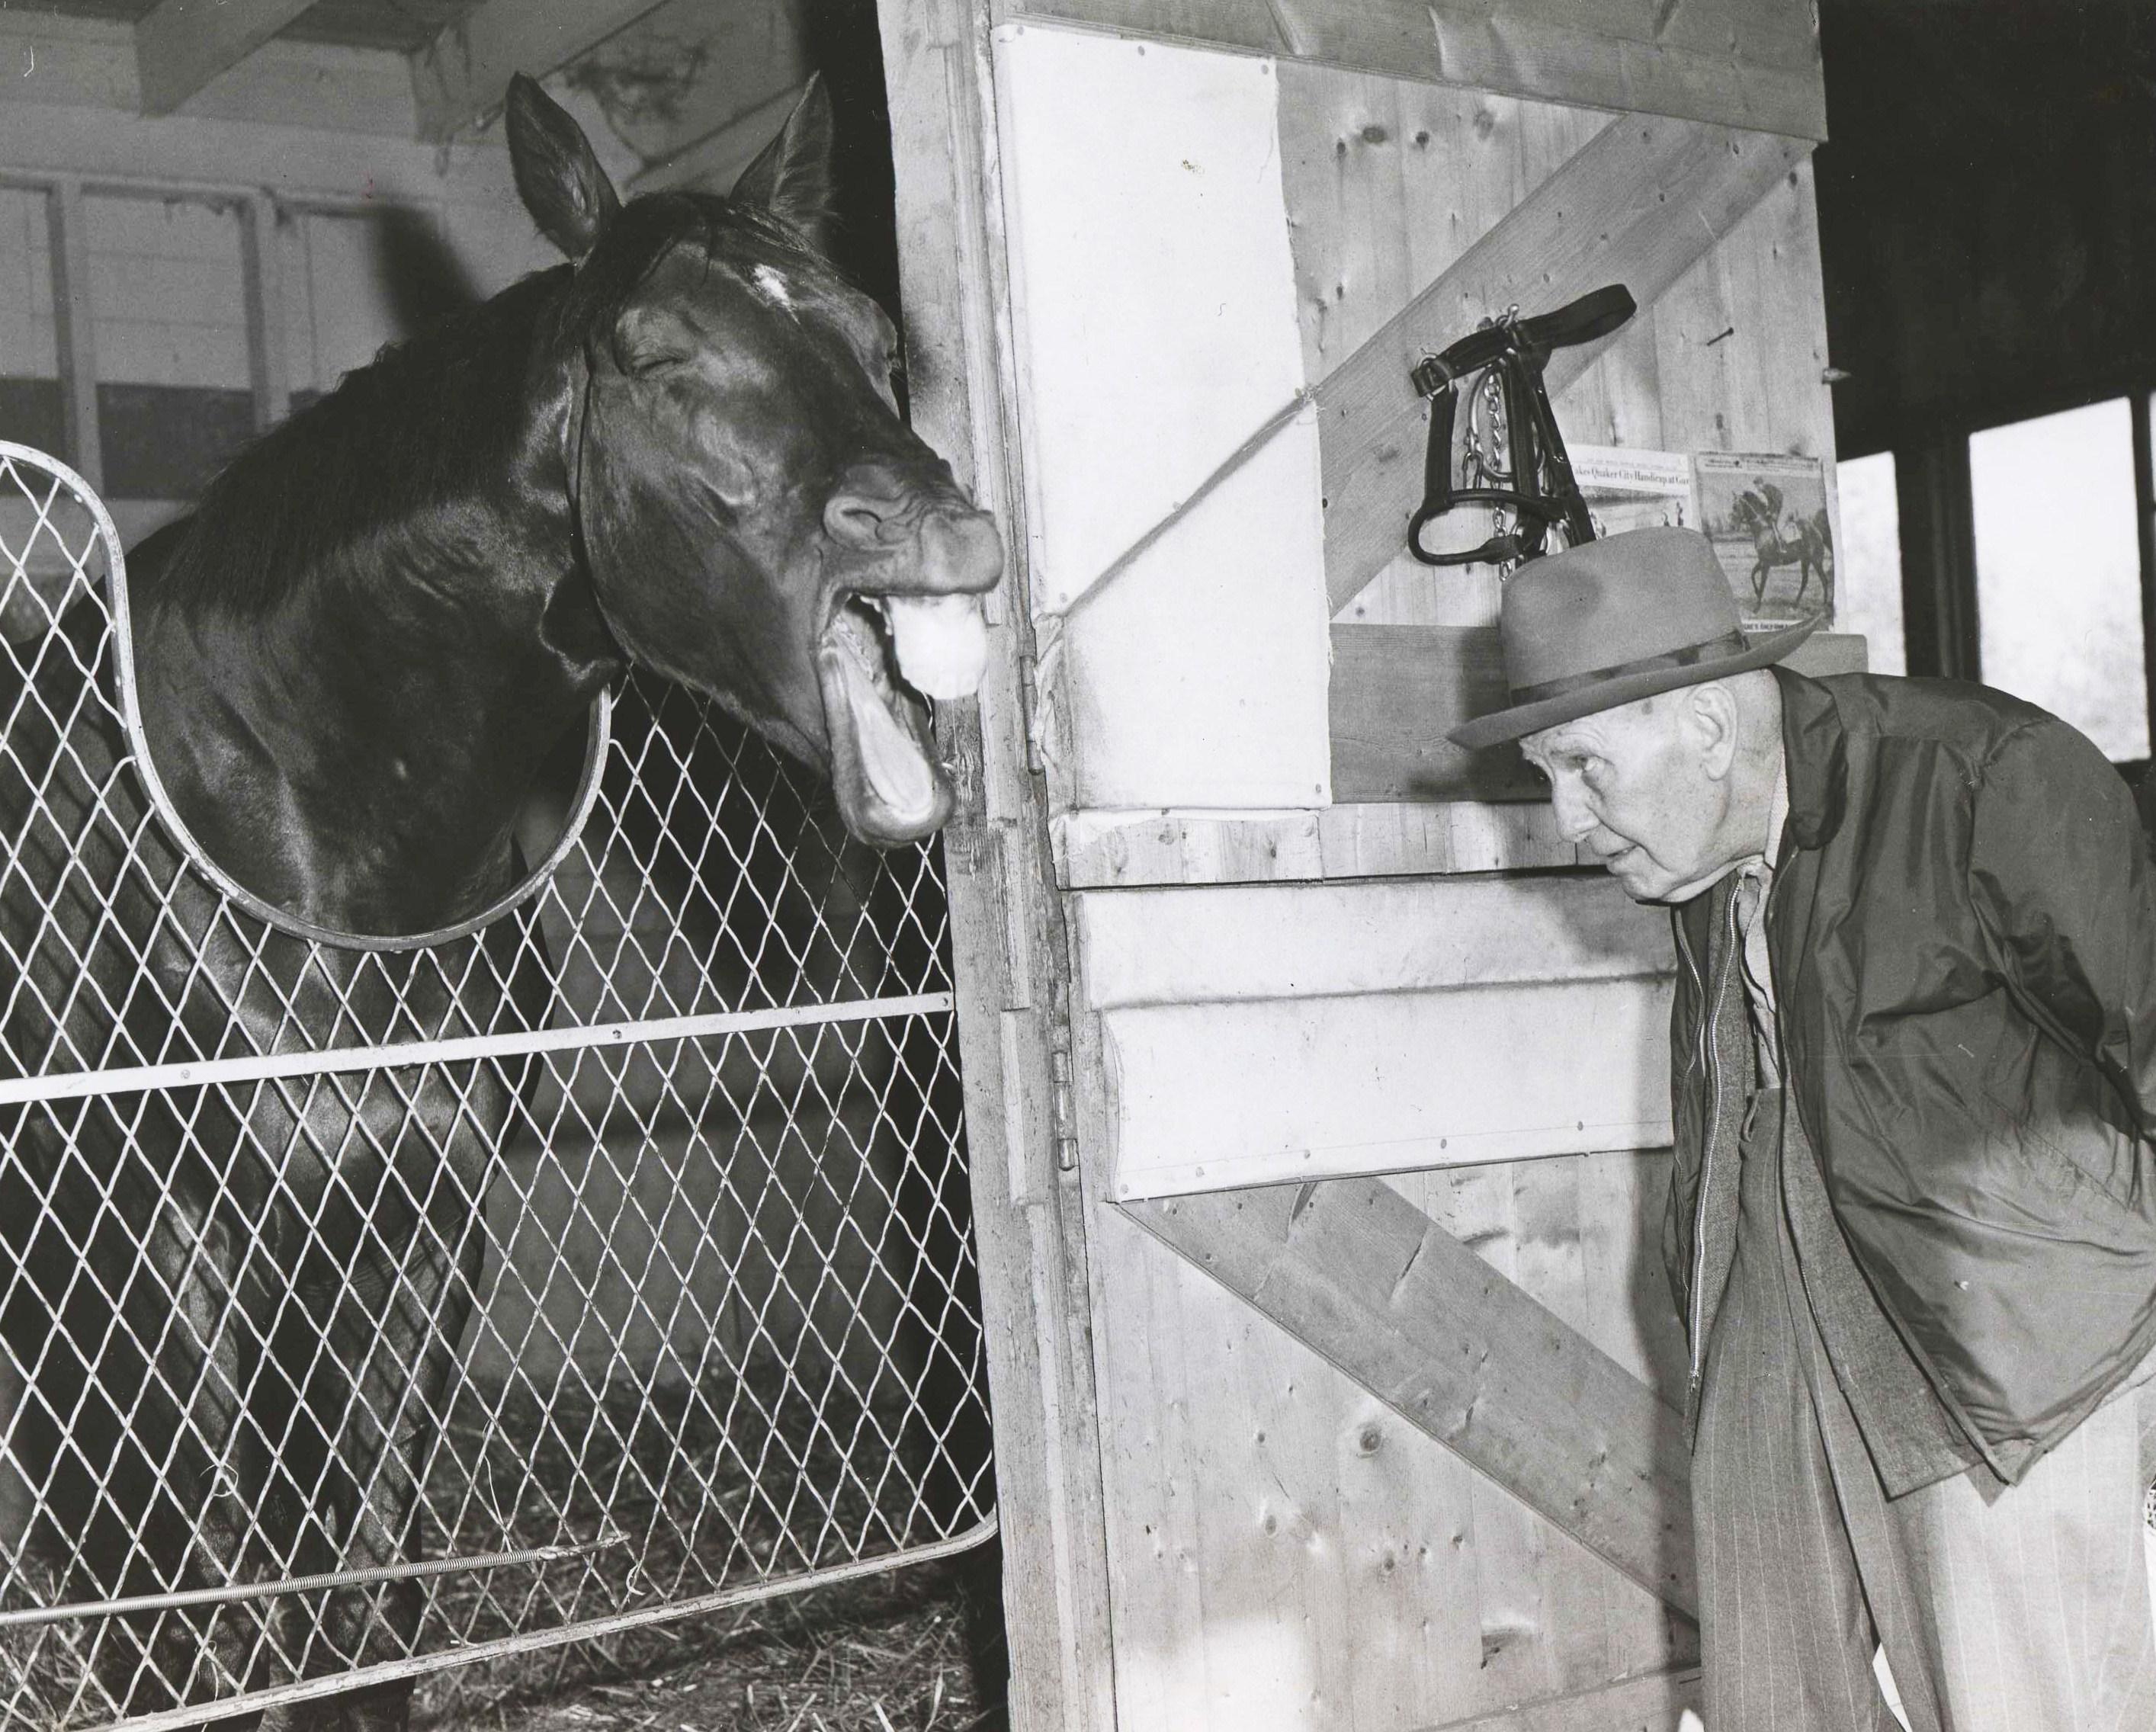 "Nashua and James ""Sunny Jim"" Fitzsimmons having a talk in the barn area at Aqueduct, October 1956 (Bert and Richard Morgan/Museum Collection)"